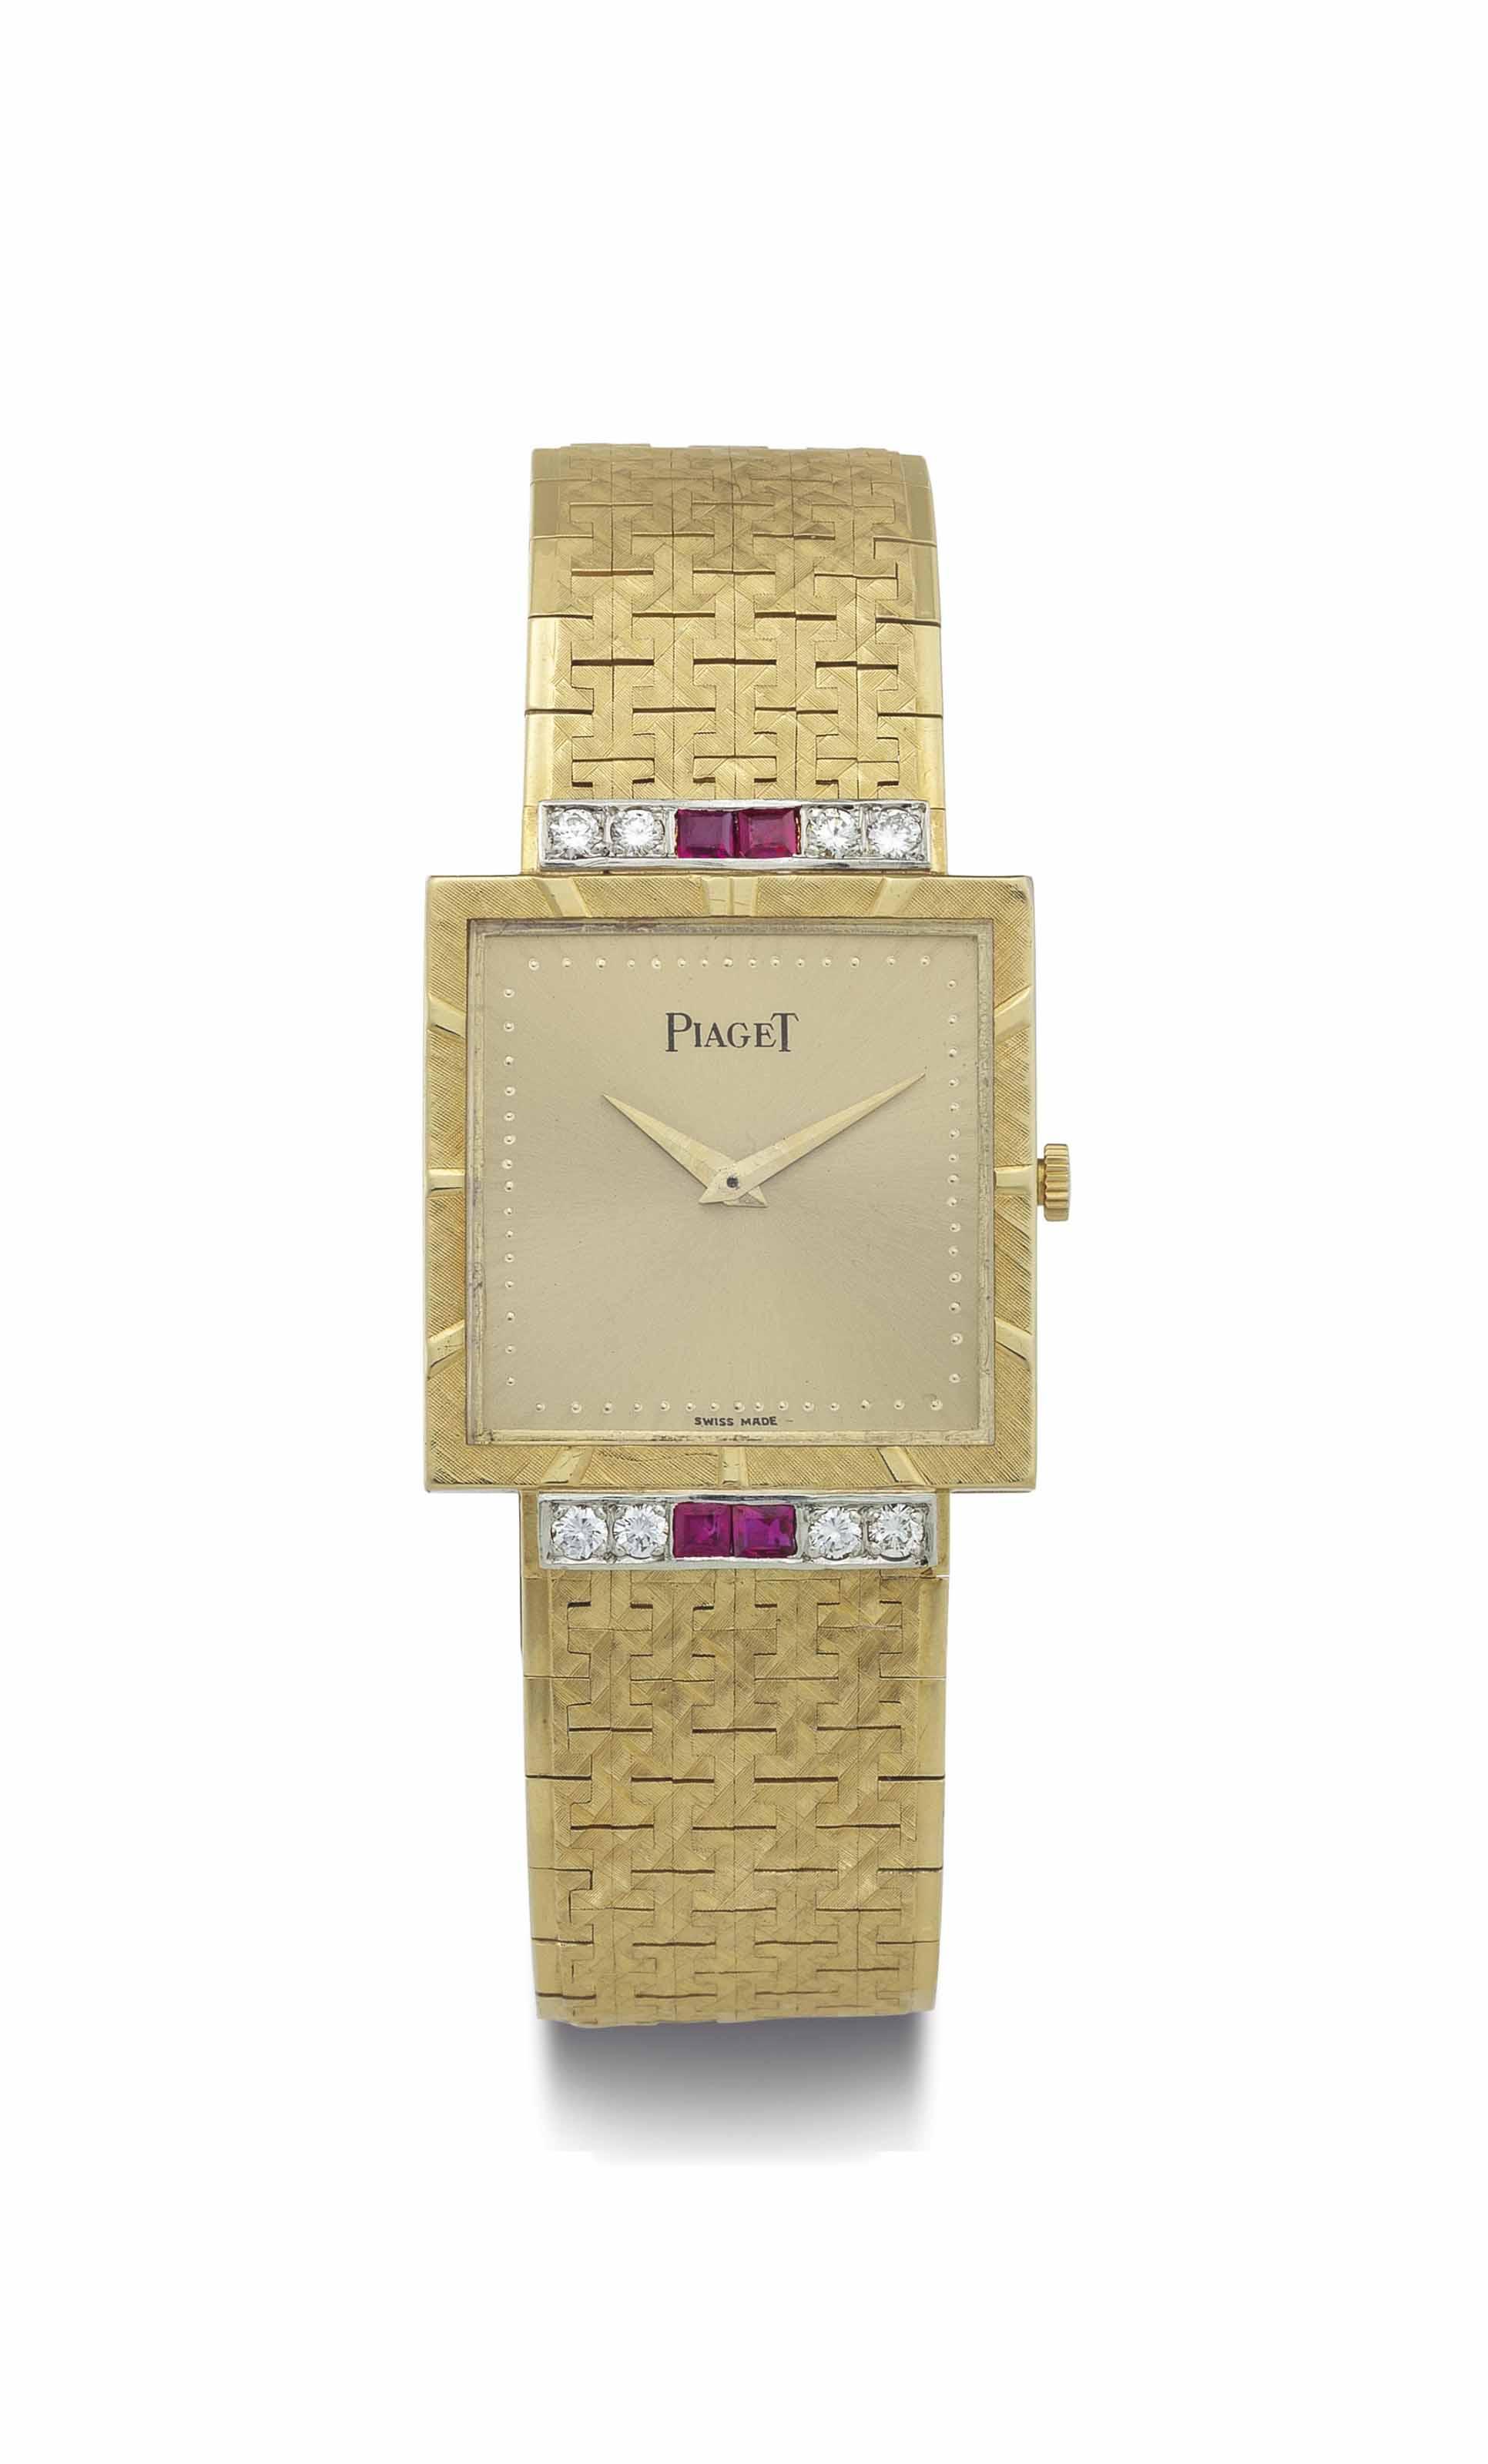 Piaget. A Fine 18k Gold, Diamond and Ruby-Set Square Wristwatch with Bracelet